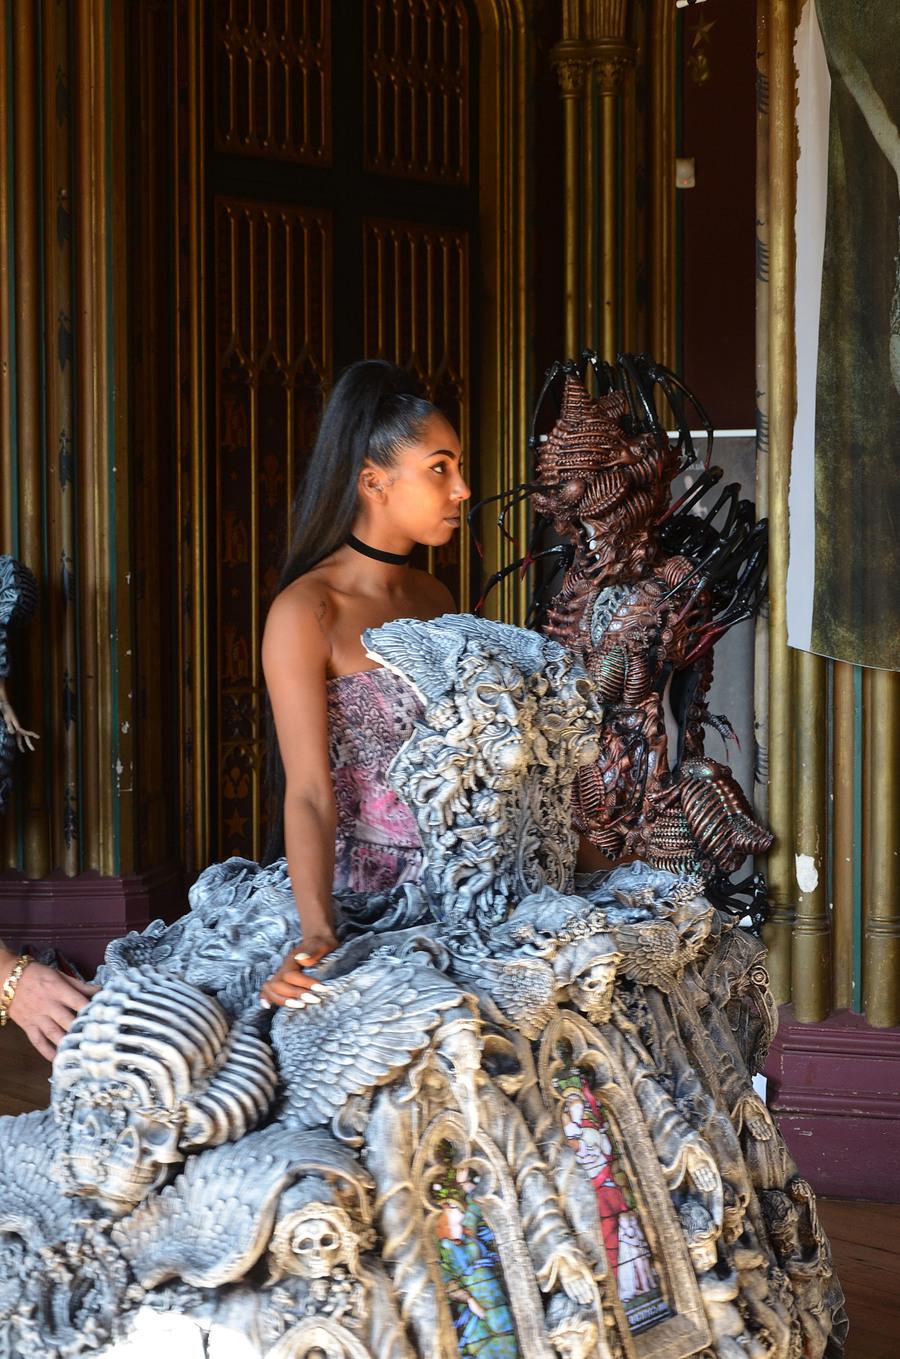 That dress / Photography by hojoimages, Model BlackBeauty / Uploaded 22nd September 2019 @ 01:42 PM